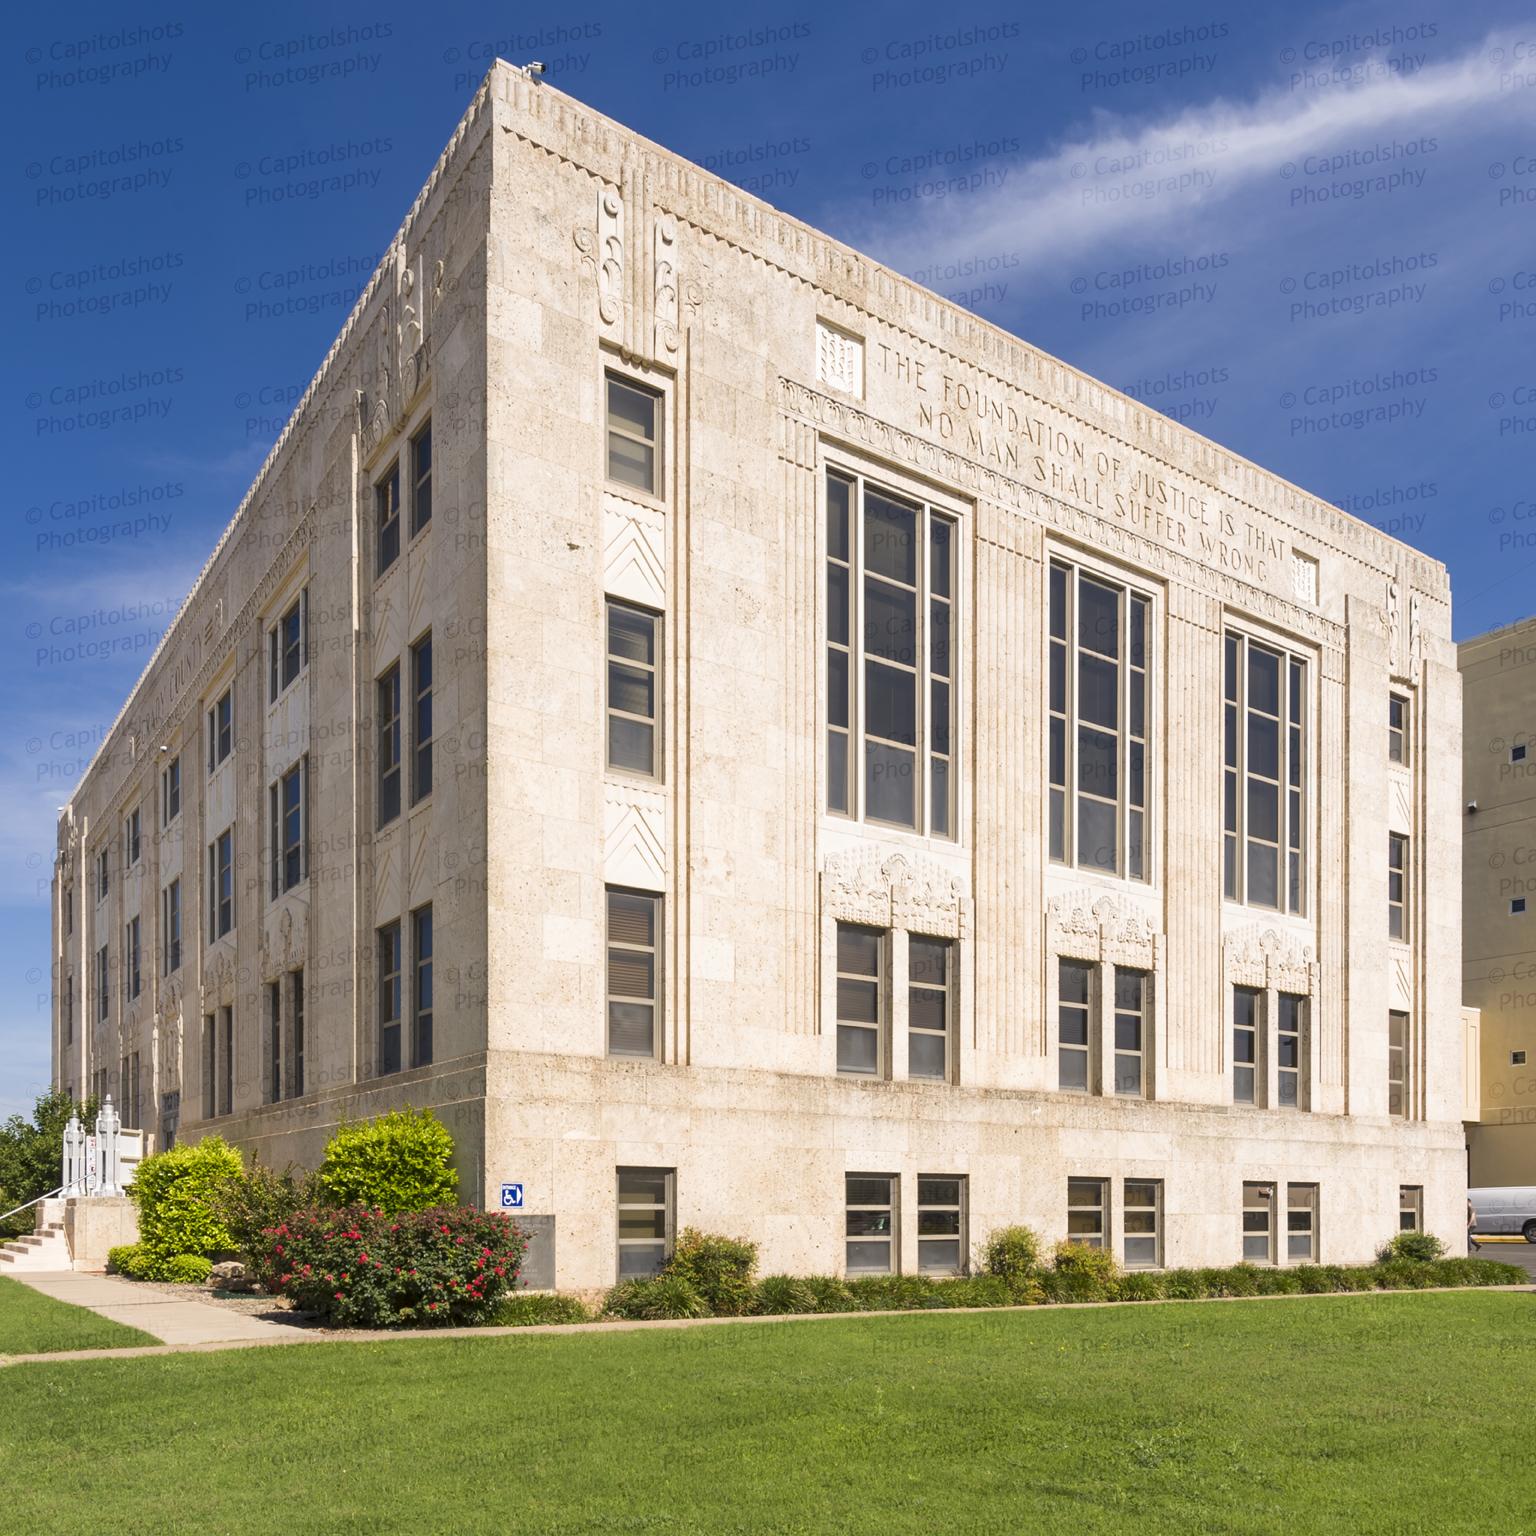 grady county court clerk public records